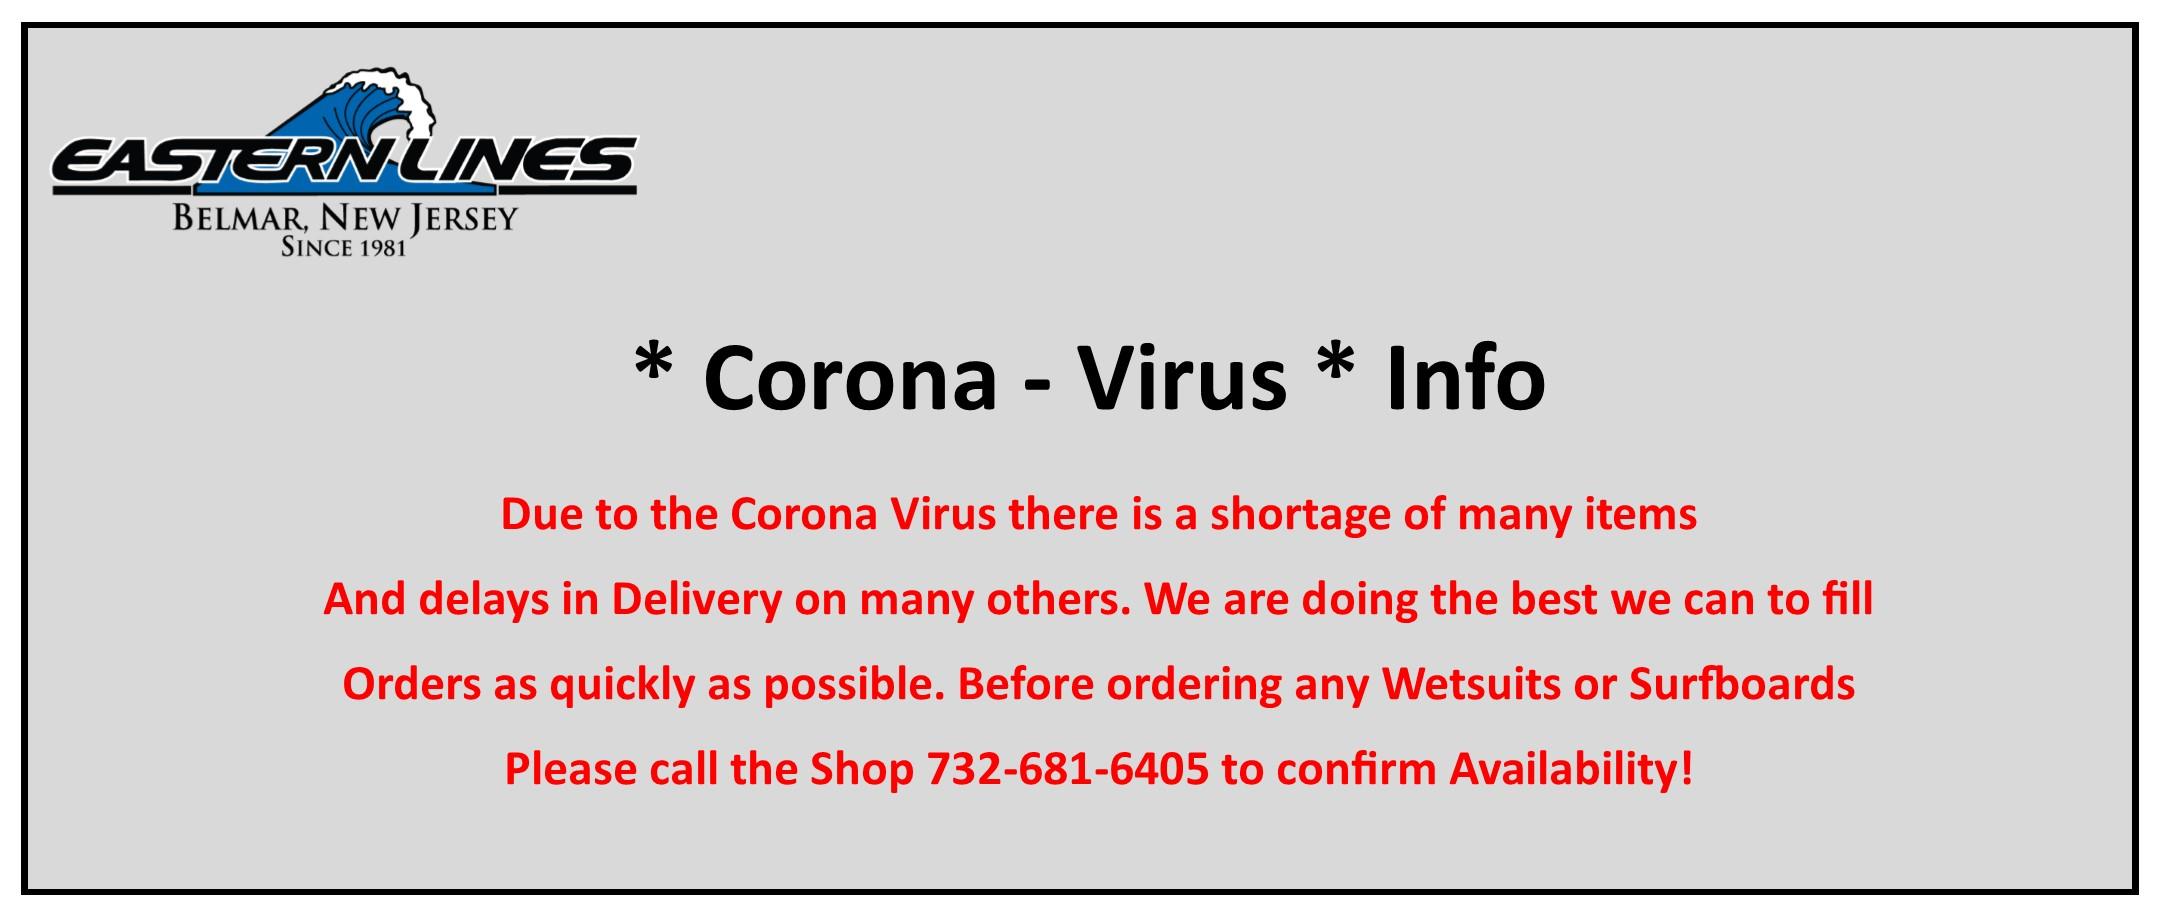 Corana Notice-2